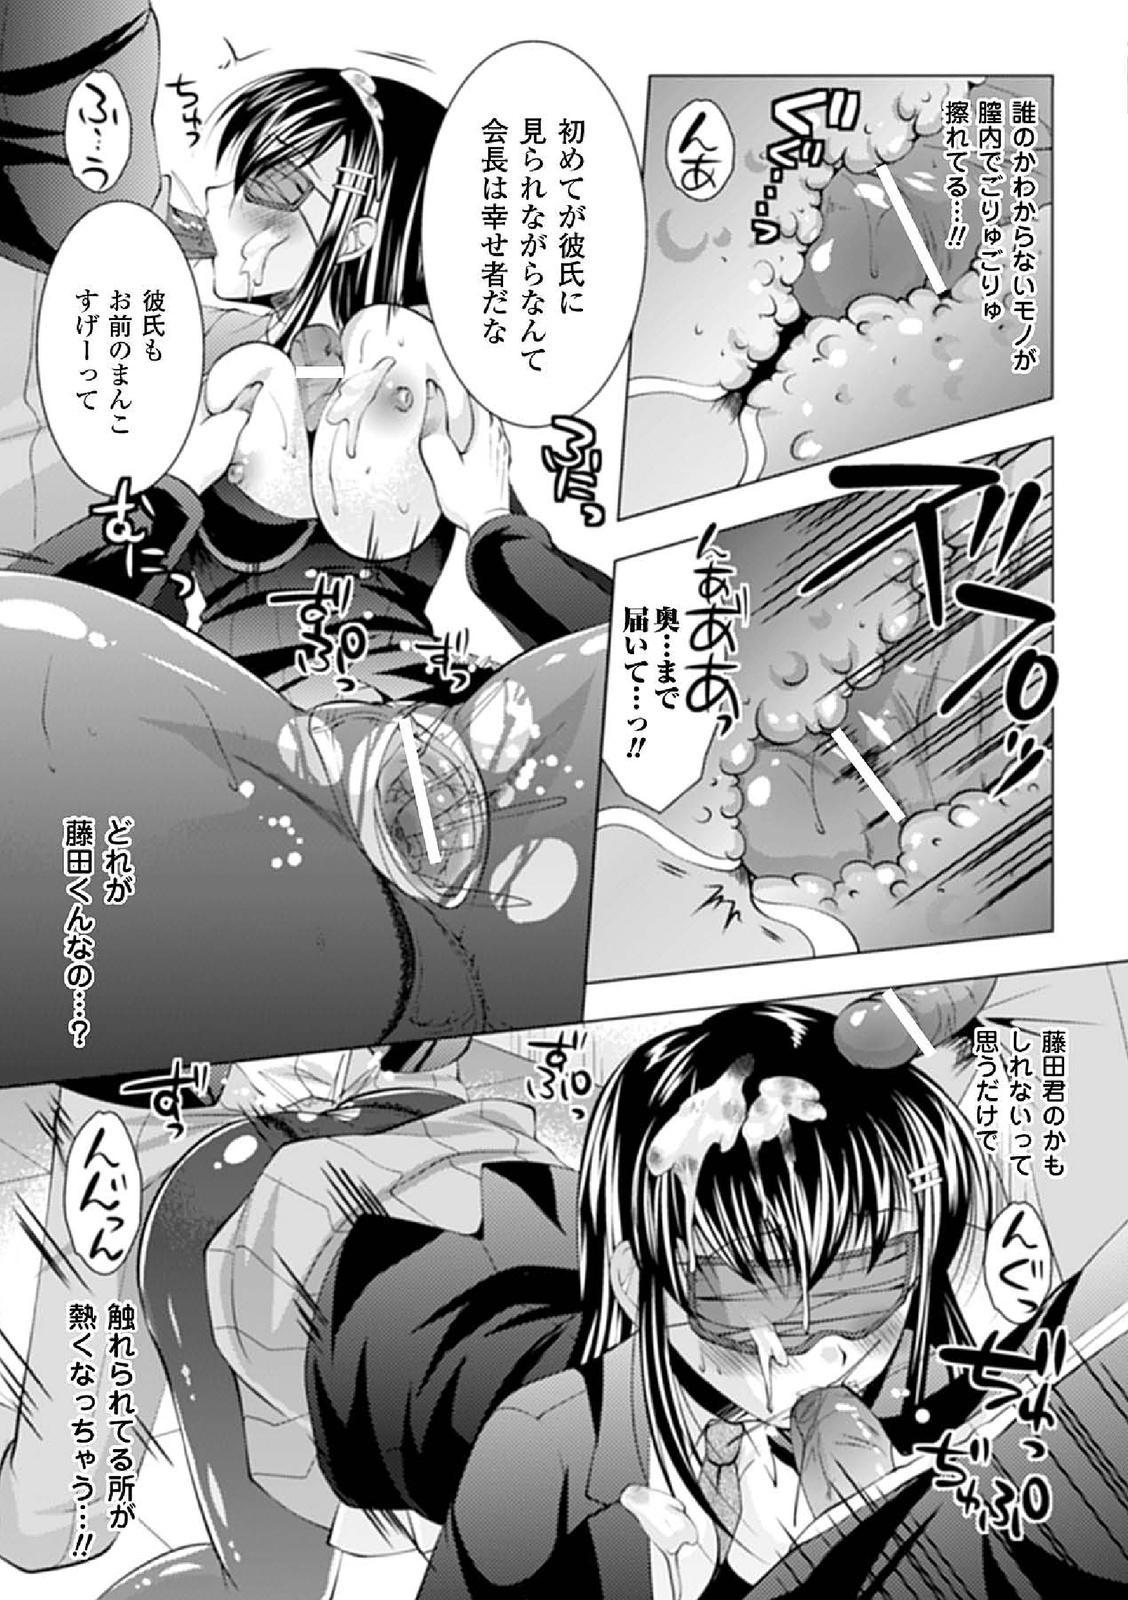 Mekakushi Anthology Comics Vol. 1 58